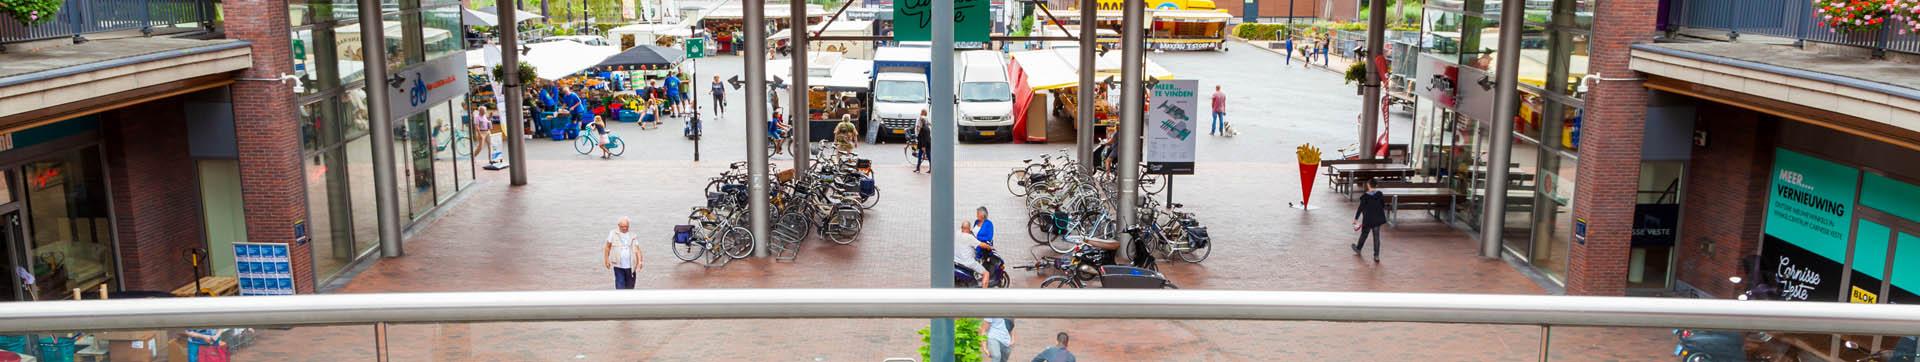 Winkelcentrum Carnisse Veste Barendrecht